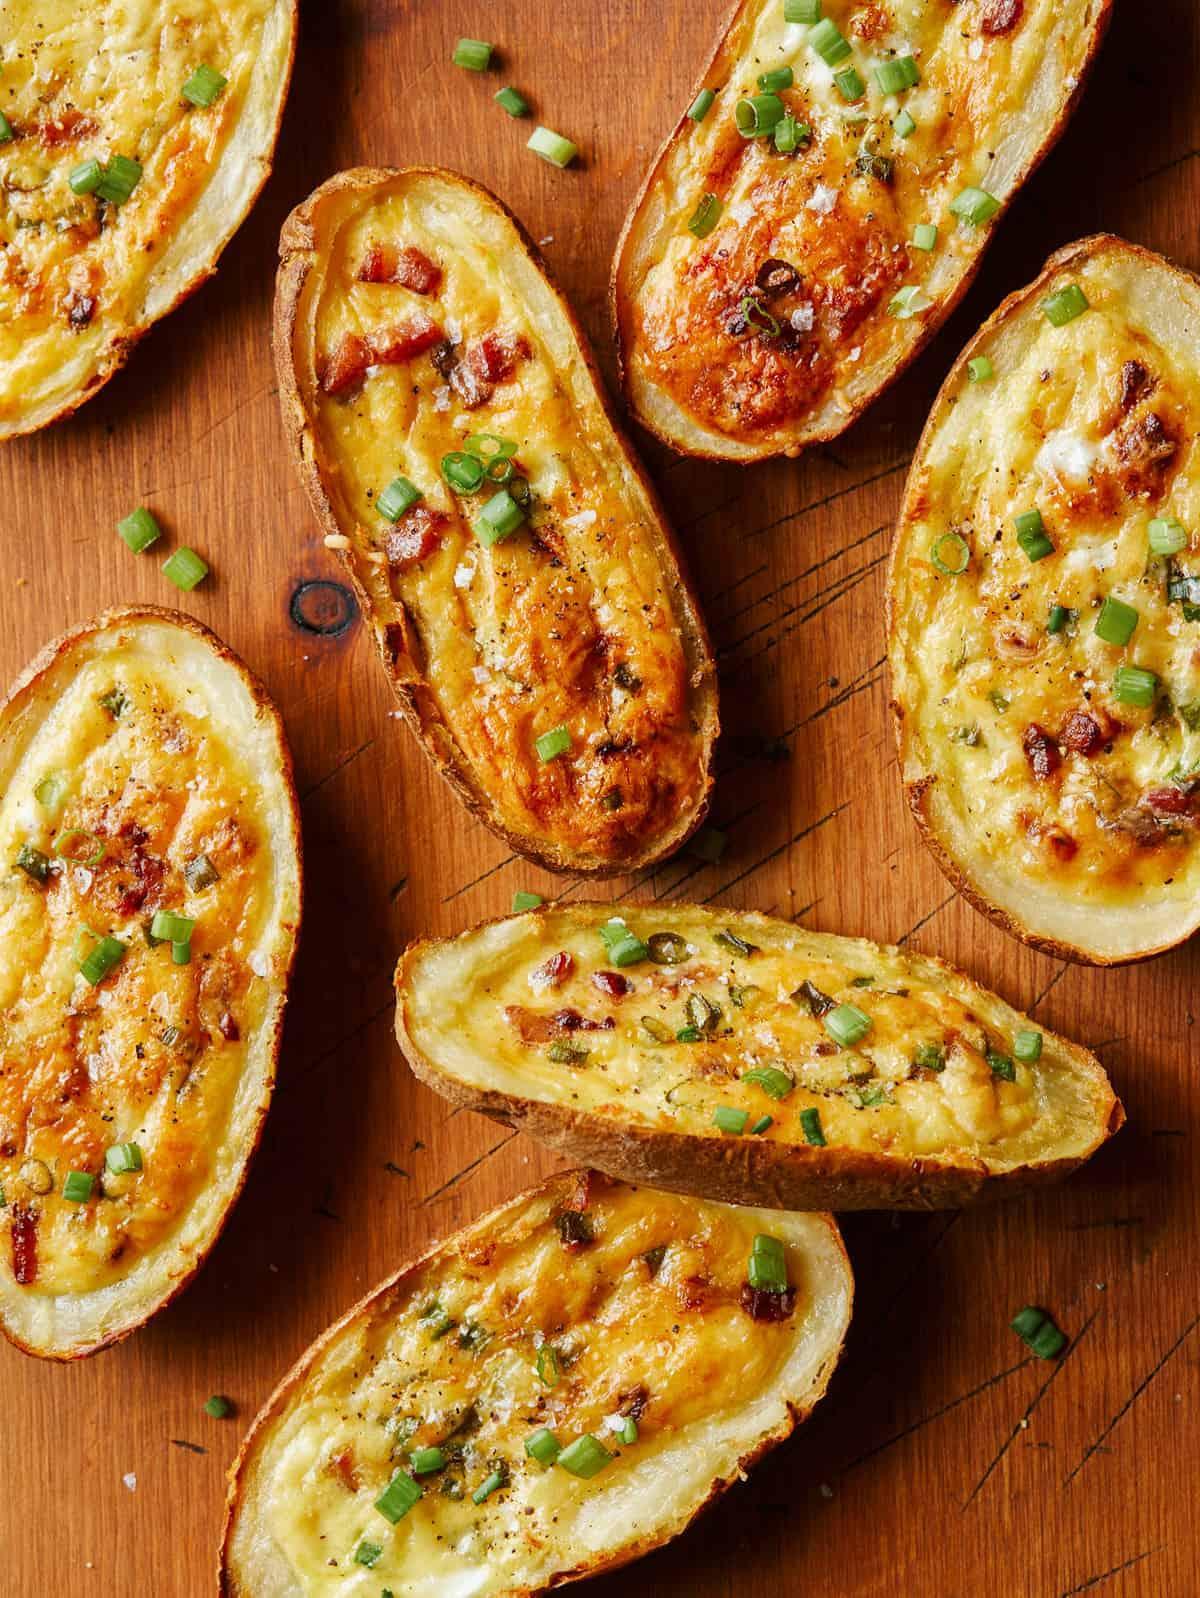 Several potato skin egg boats on wood.